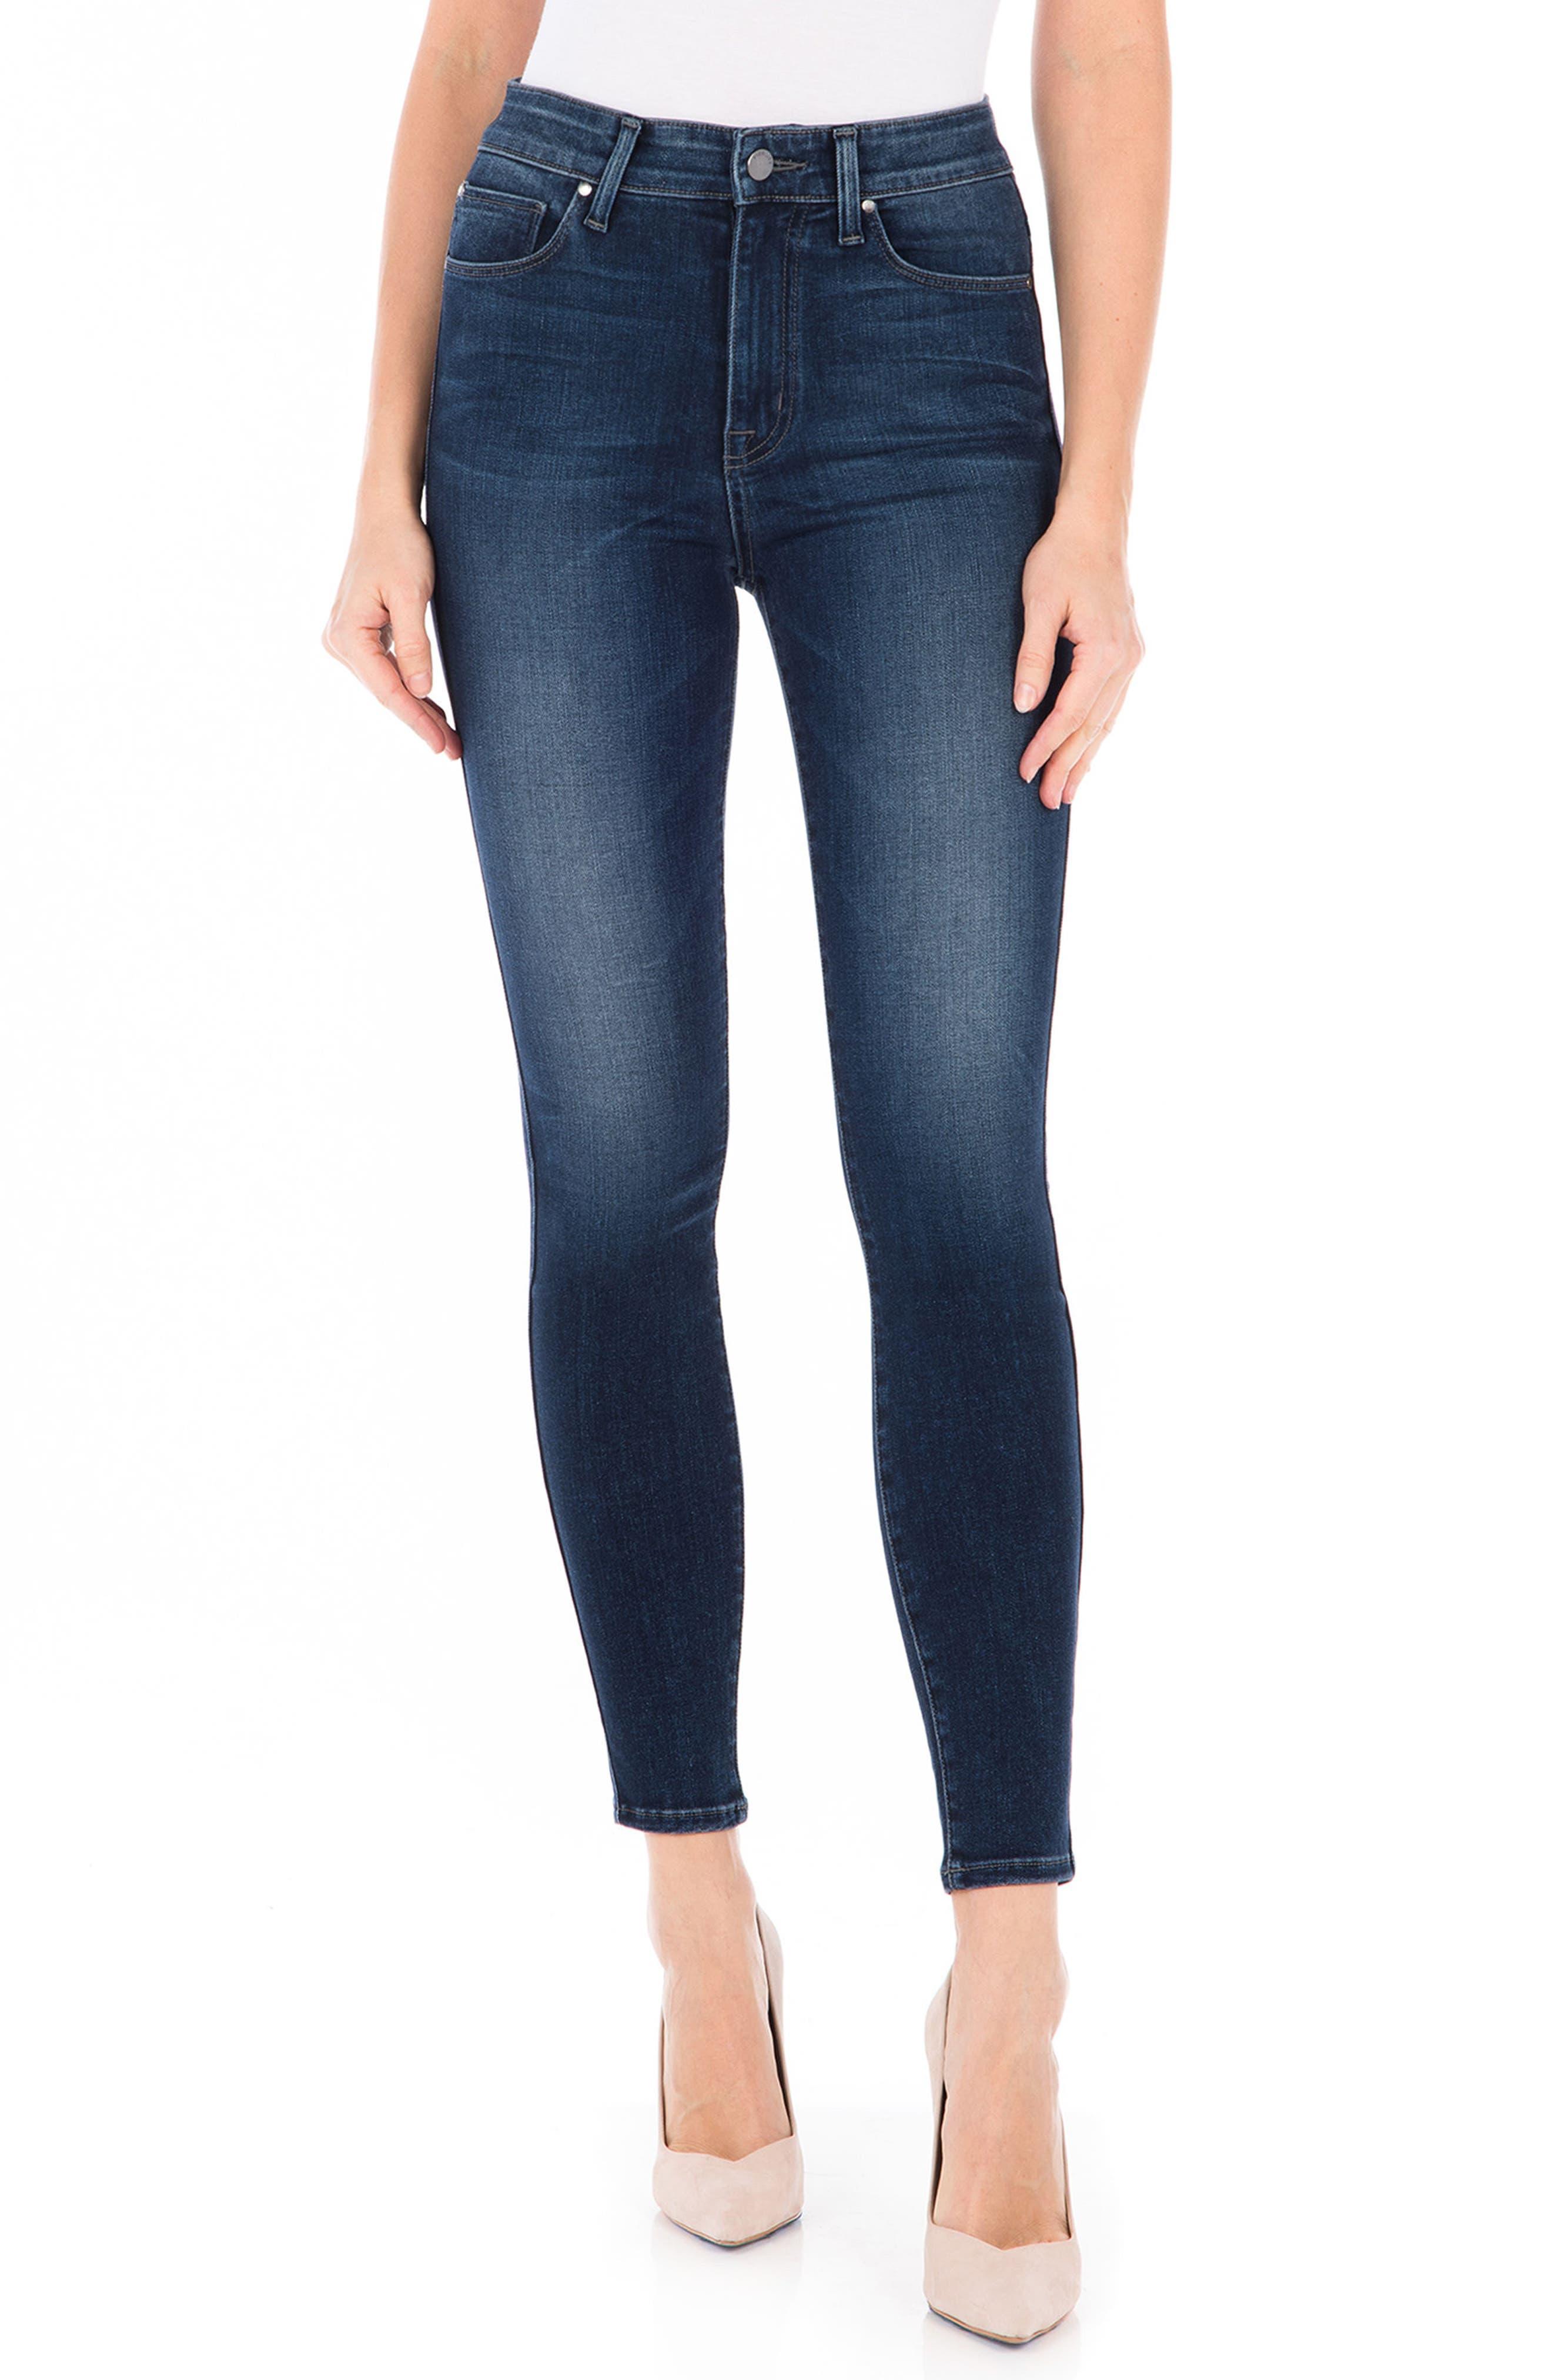 Luna High Waist Skinny Jeans,                         Main,                         color, Blue Suede